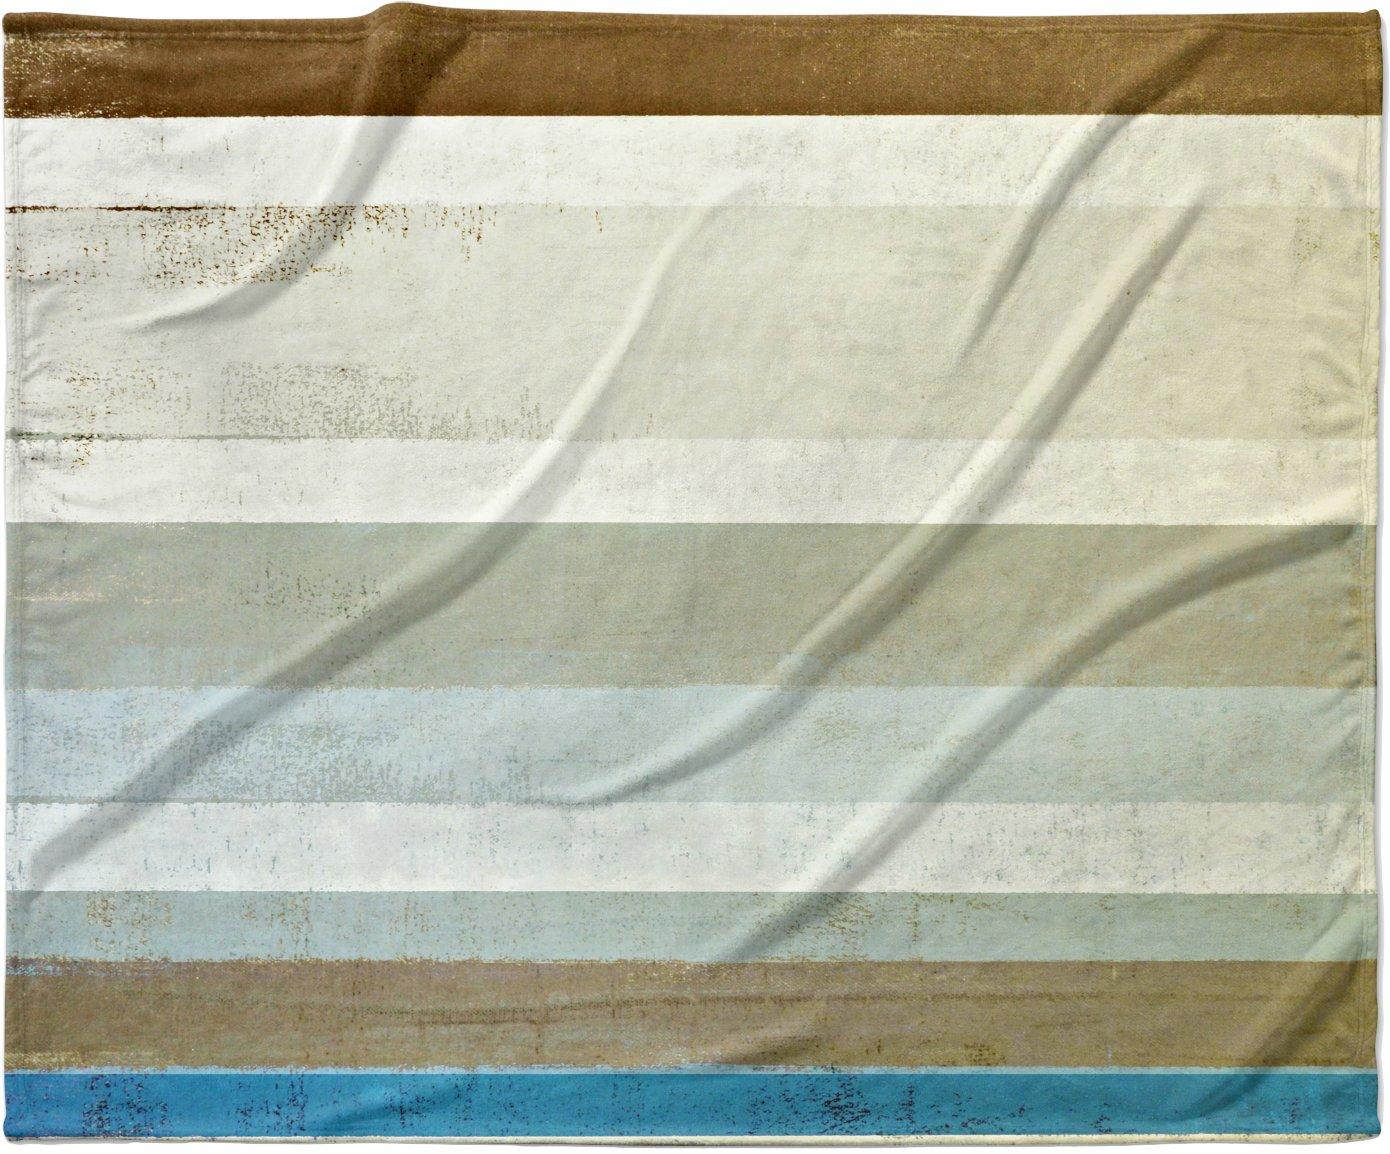 KESS InHouse CarolLynn Tice 'Invent' Neutral Brown Fleece Baby Blanket, 40' x 30'